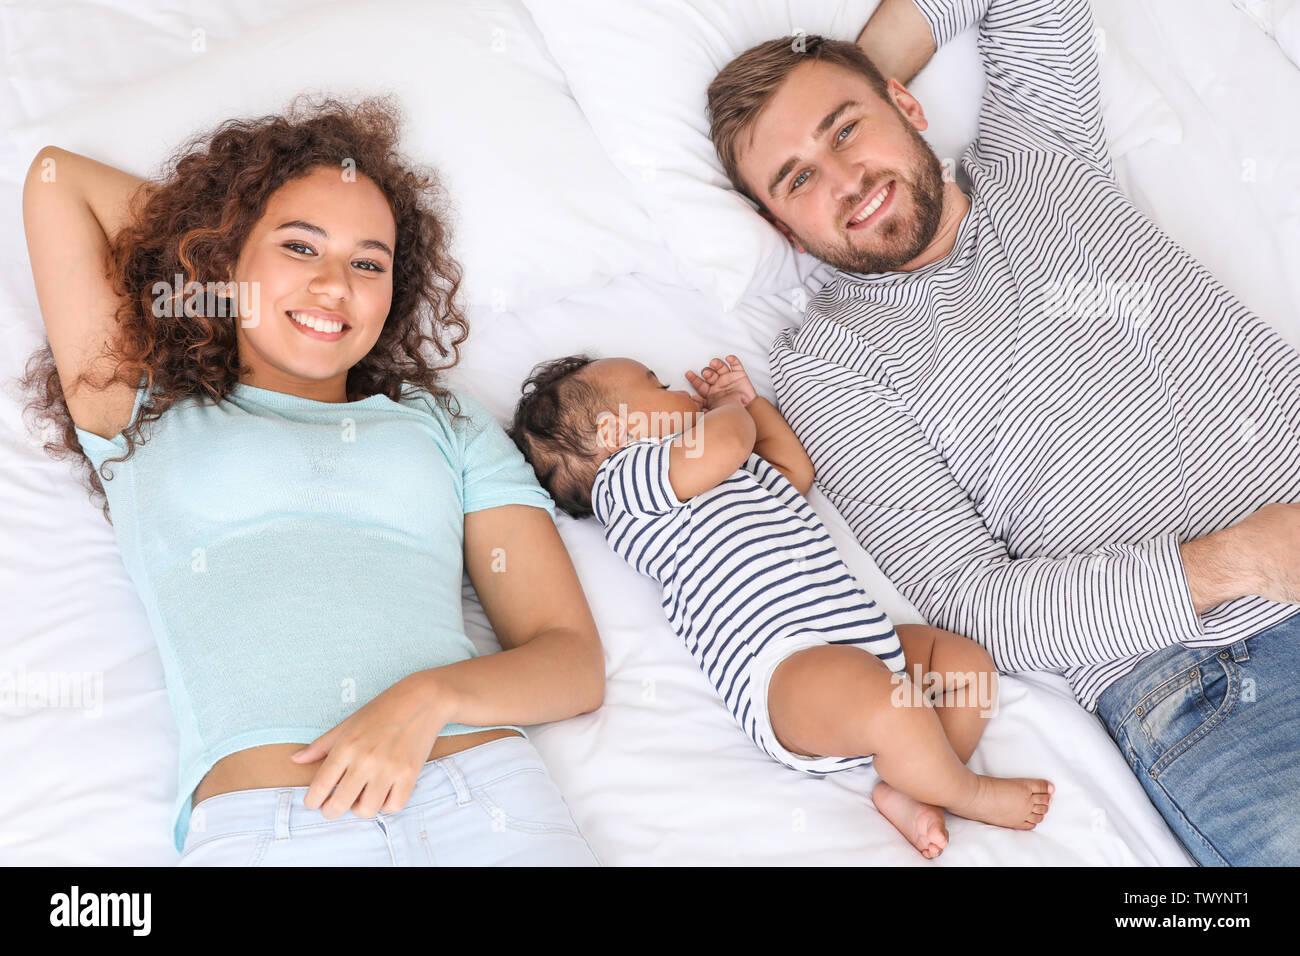 Portrait of happy interracial family in bedroom - Stock Image